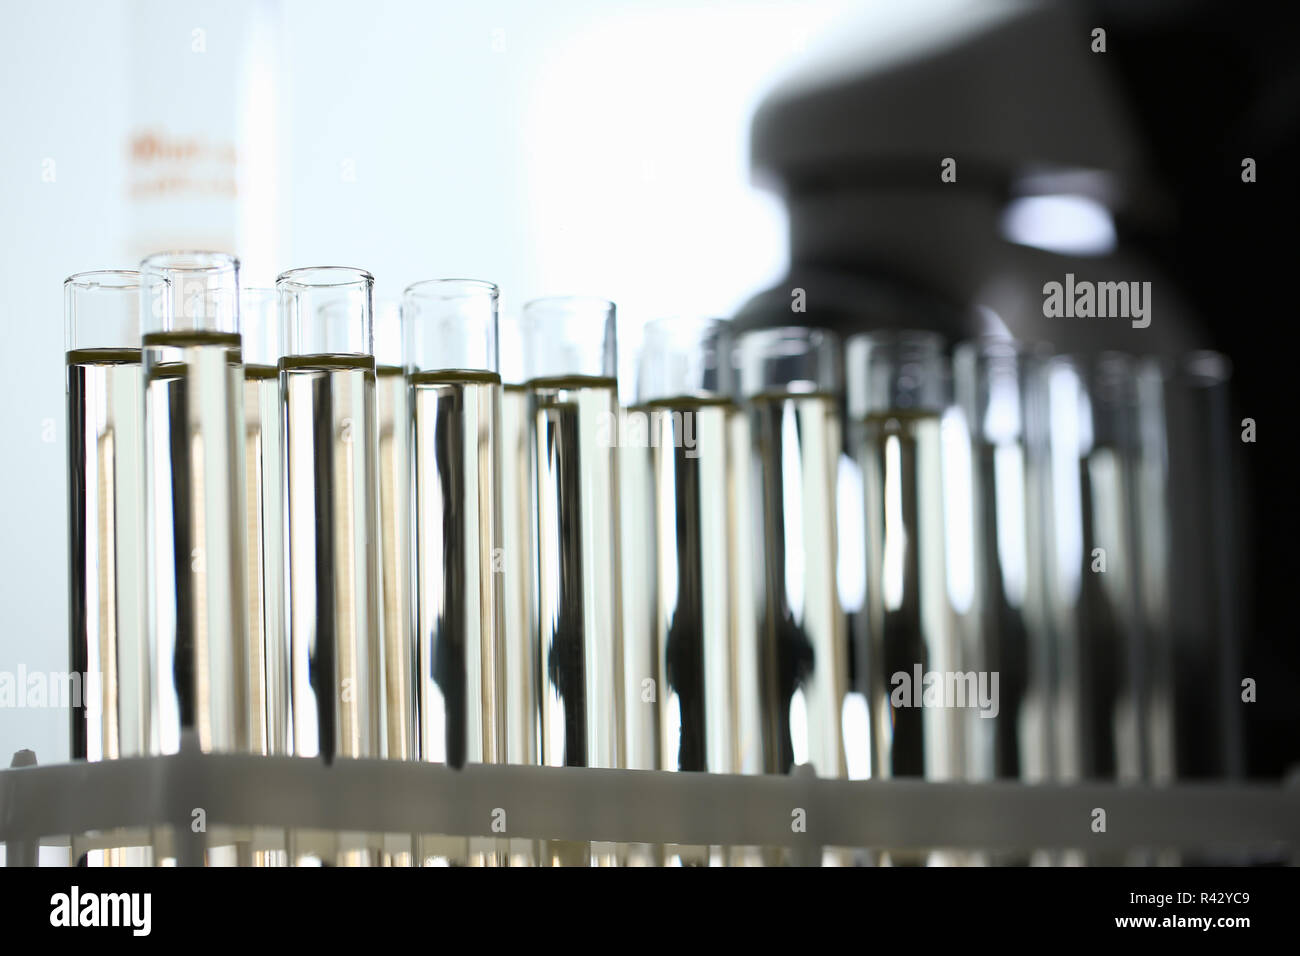 Yellow liquid spilled petrol additive innovative supply - Stock Image